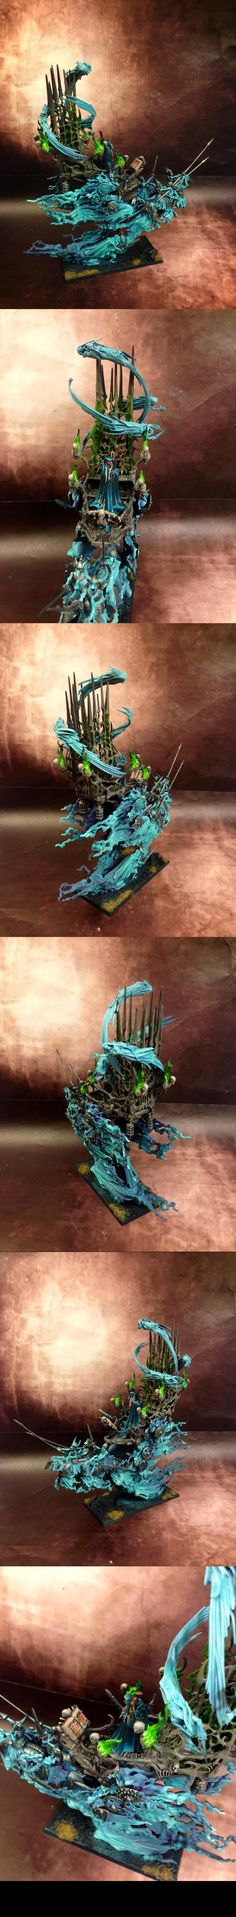 Aosol, Mortis Engine, Vampire Counts, Warhammer Fantasy